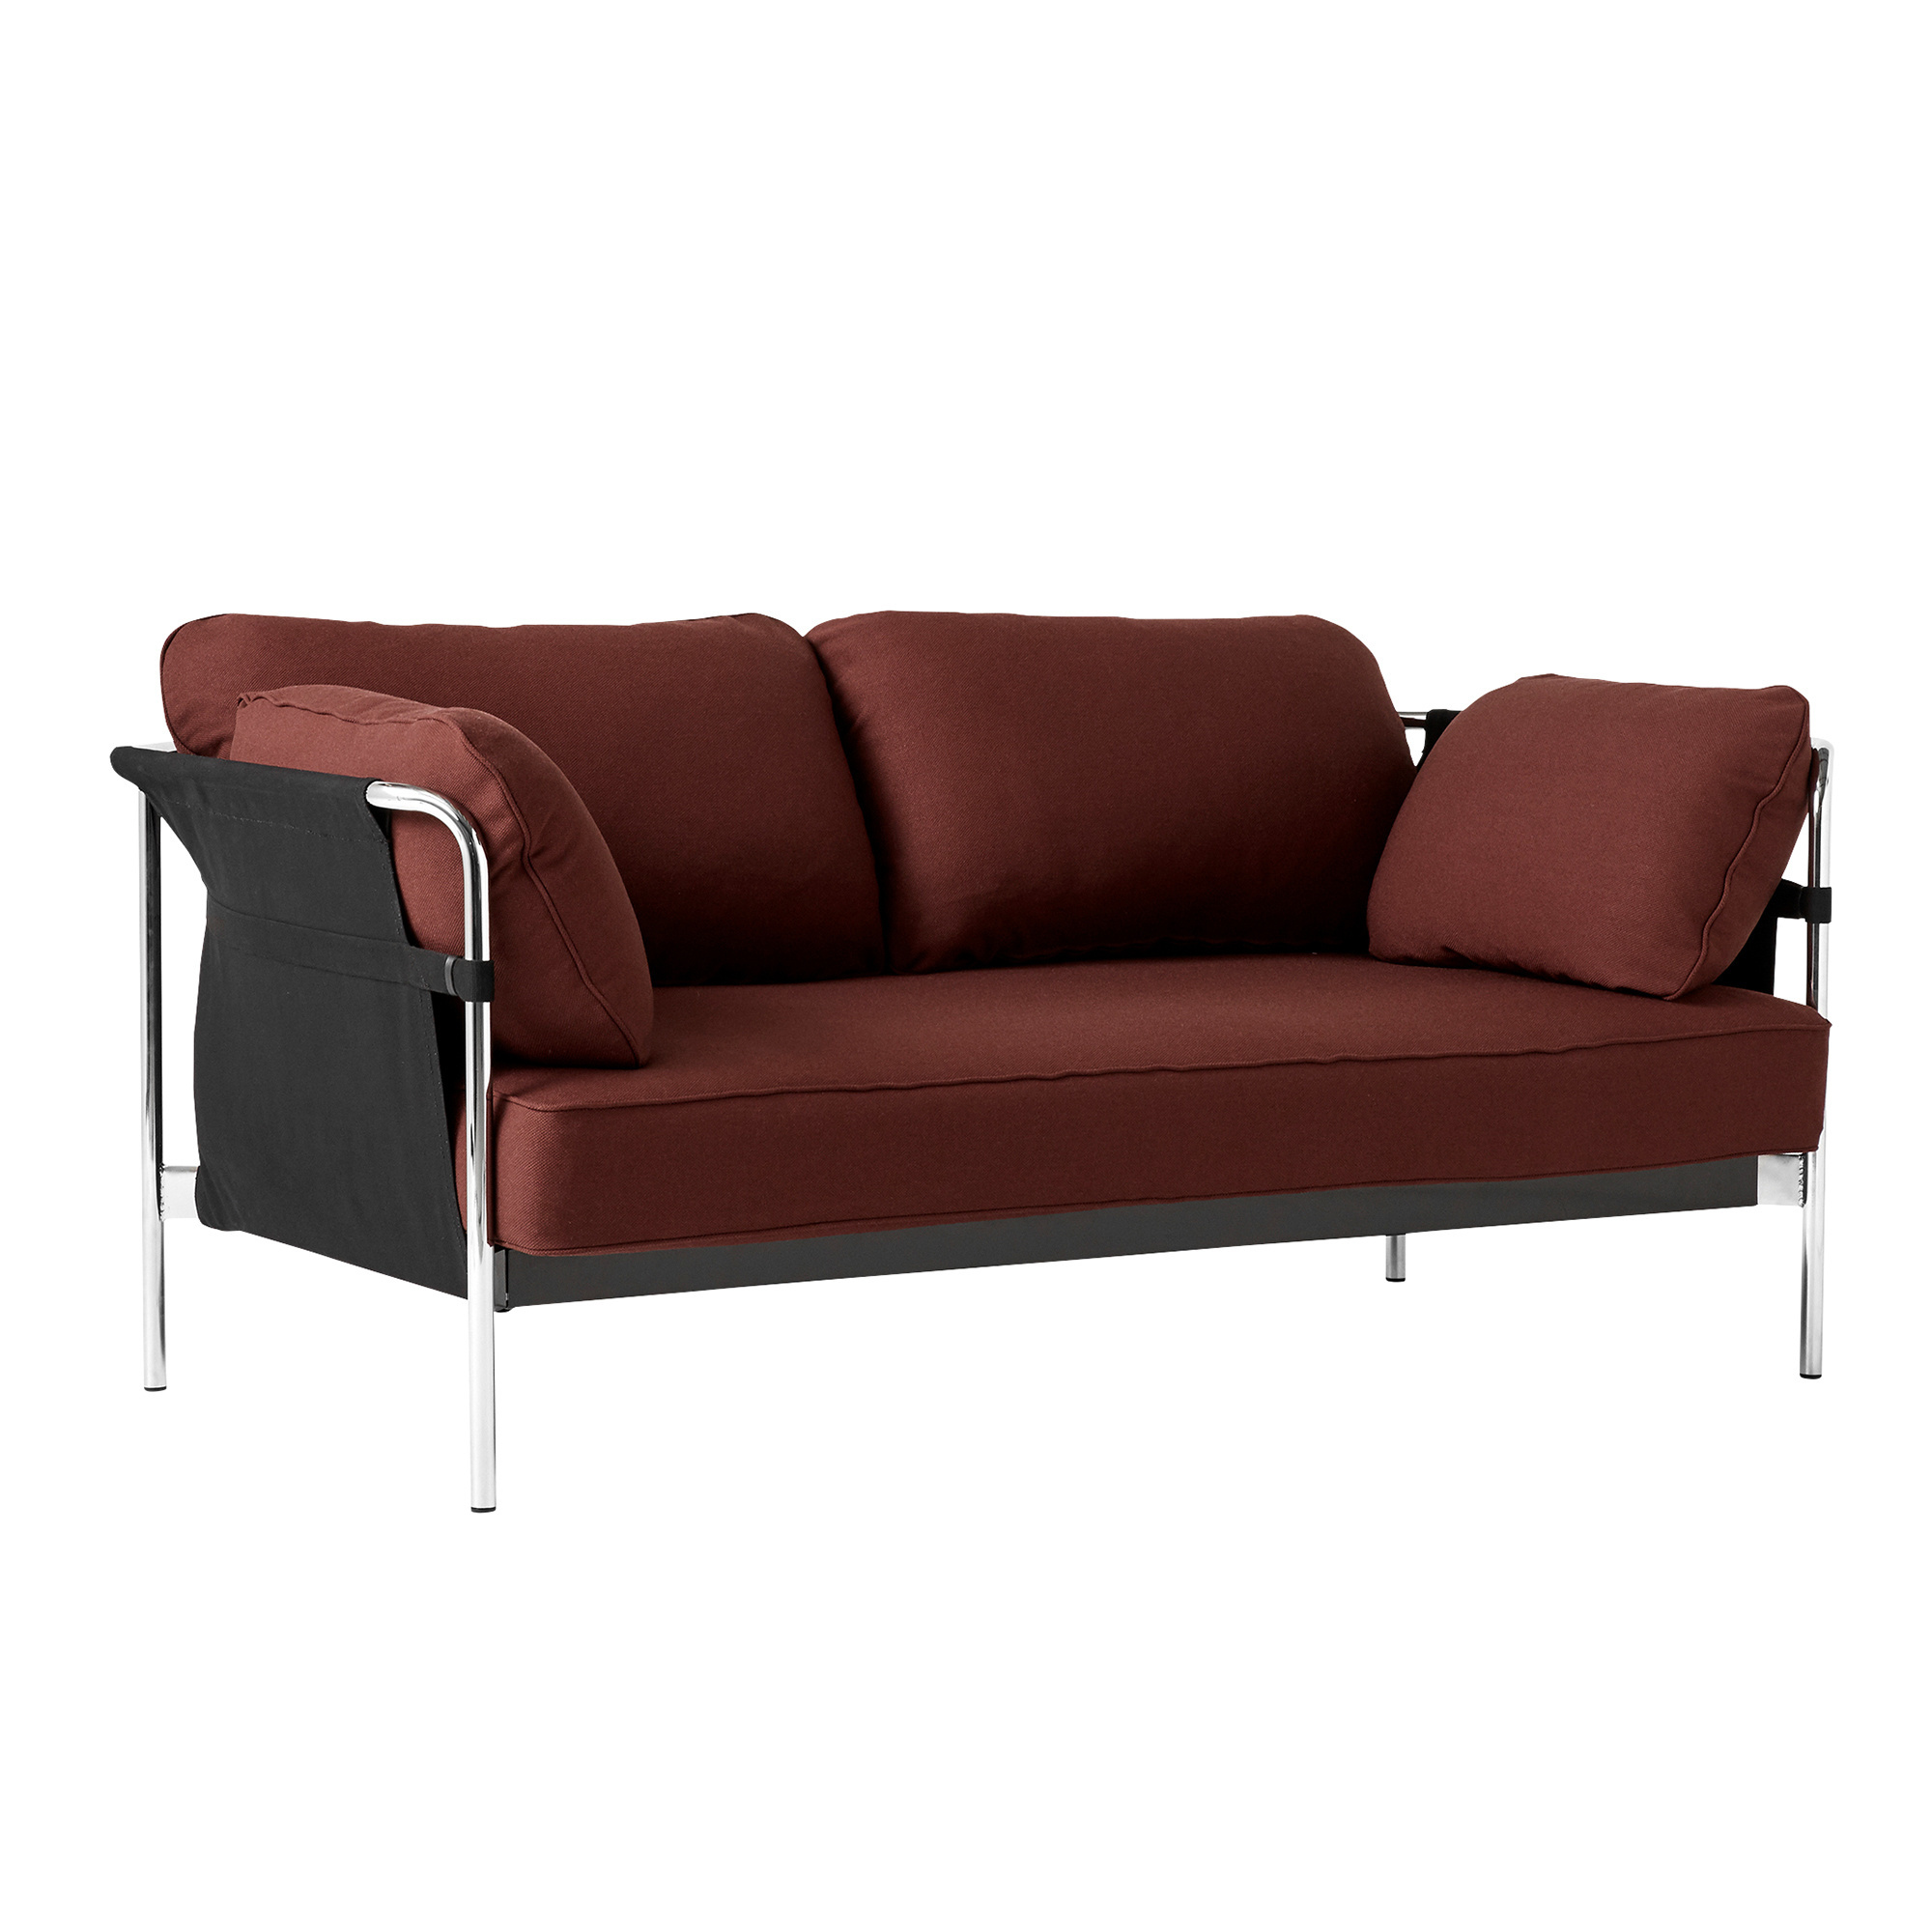 B/üro Sofagarnitur Couch 2-er Wohnzimmer Velours Stoff Braun Holzf/ü/ße Cosmic 70 Sofa Kera 2-Sitzer Loungesofa